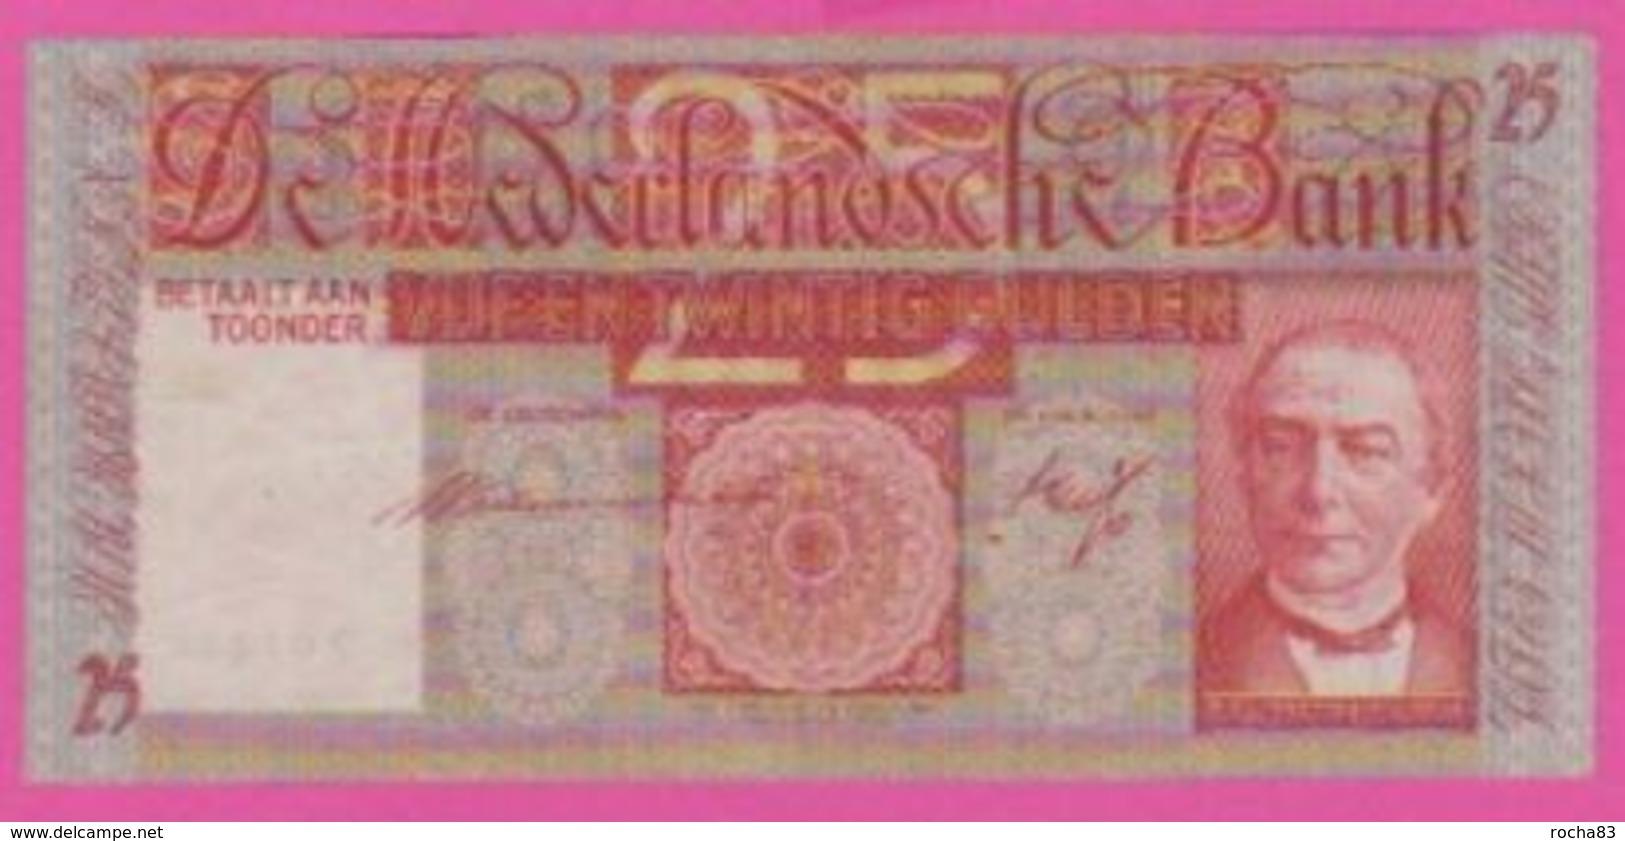 NETHERLANDS - PAYS BAS - 25 Gulden Du 20 05 1939  - Pick 50 TB+ - [2] 1815-… : Royaume Des Pays-Bas